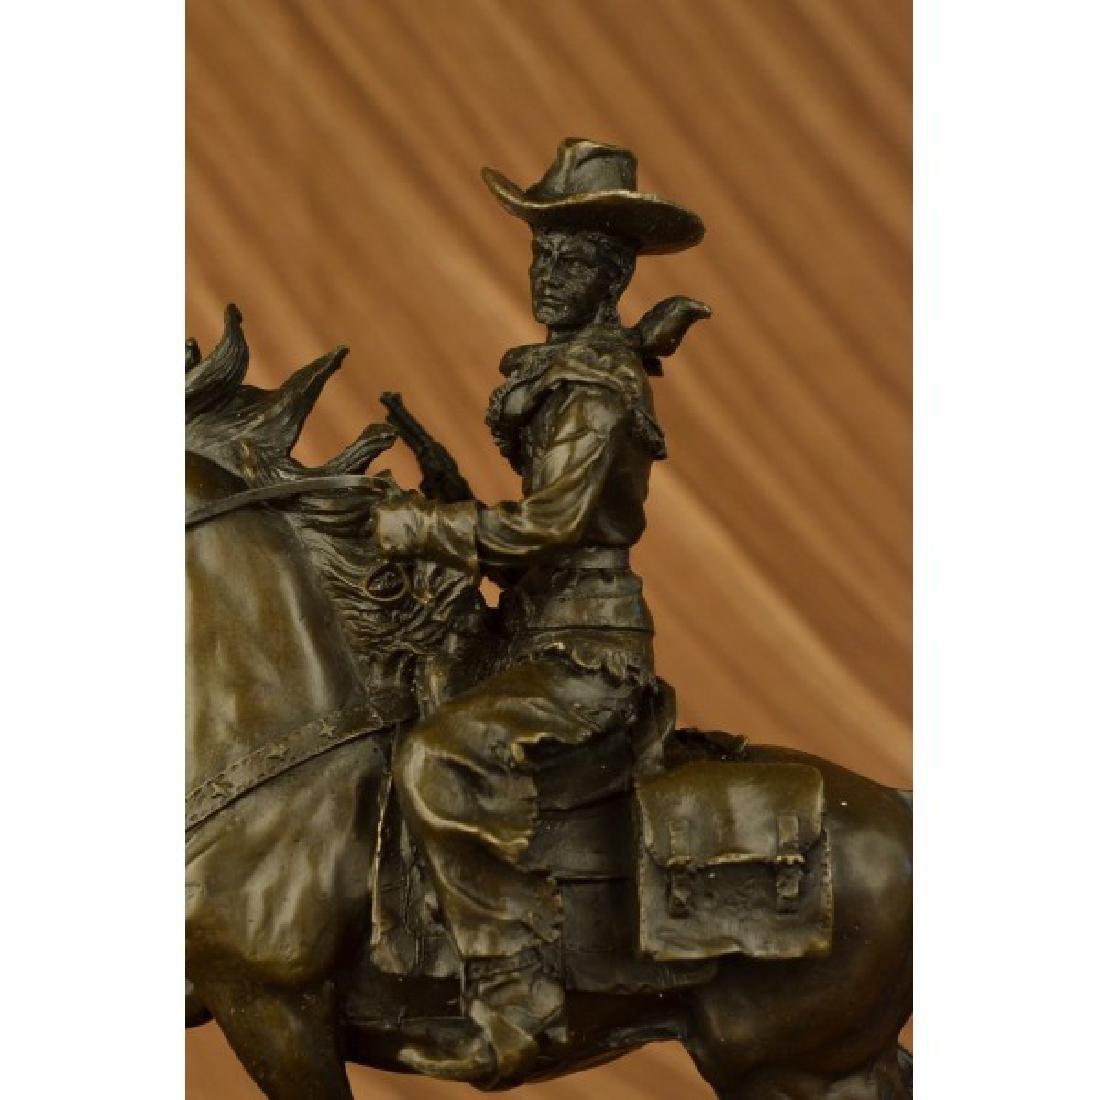 Western Cowboy Horse Bronze Sculpture on Marble Base - 5